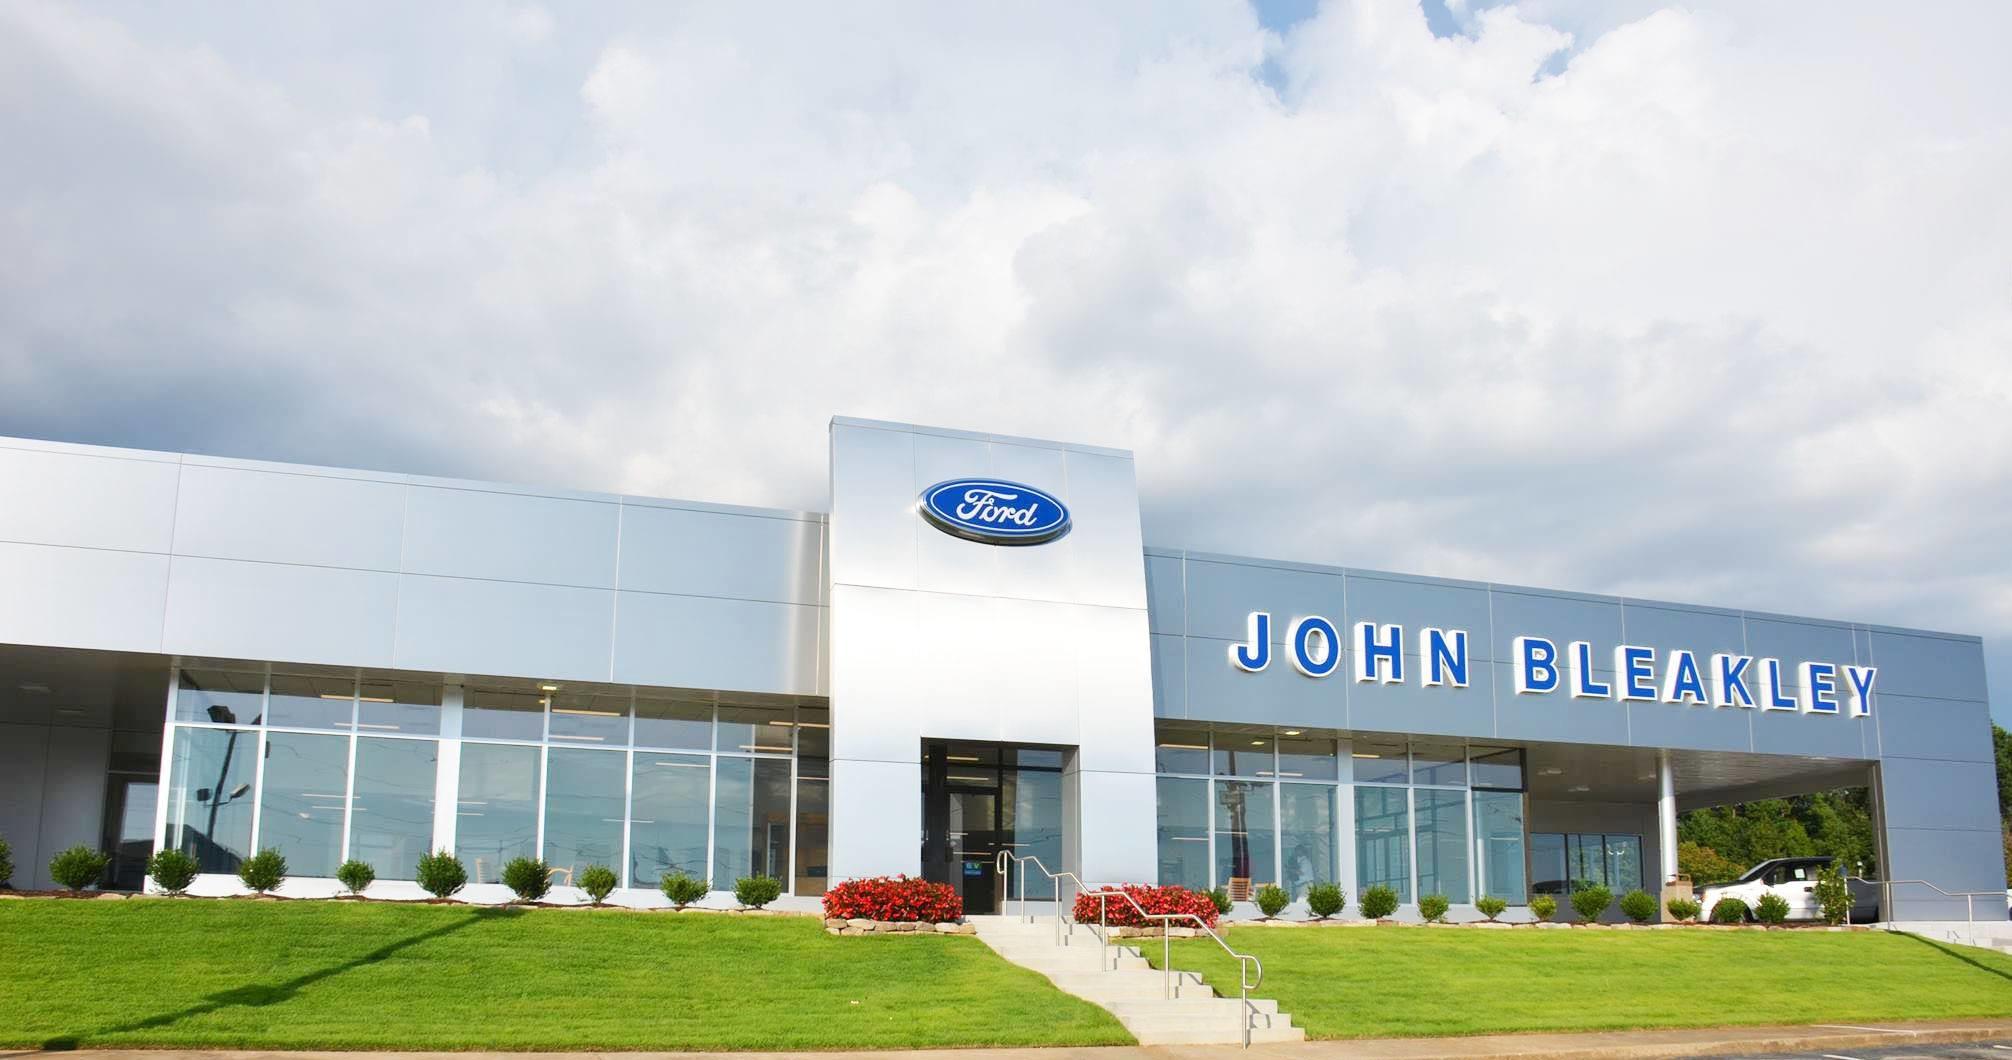 John Bleakley Ford >> John Bleakley Ford, Lithia Springs Georgia (GA) - LocalDatabase.com